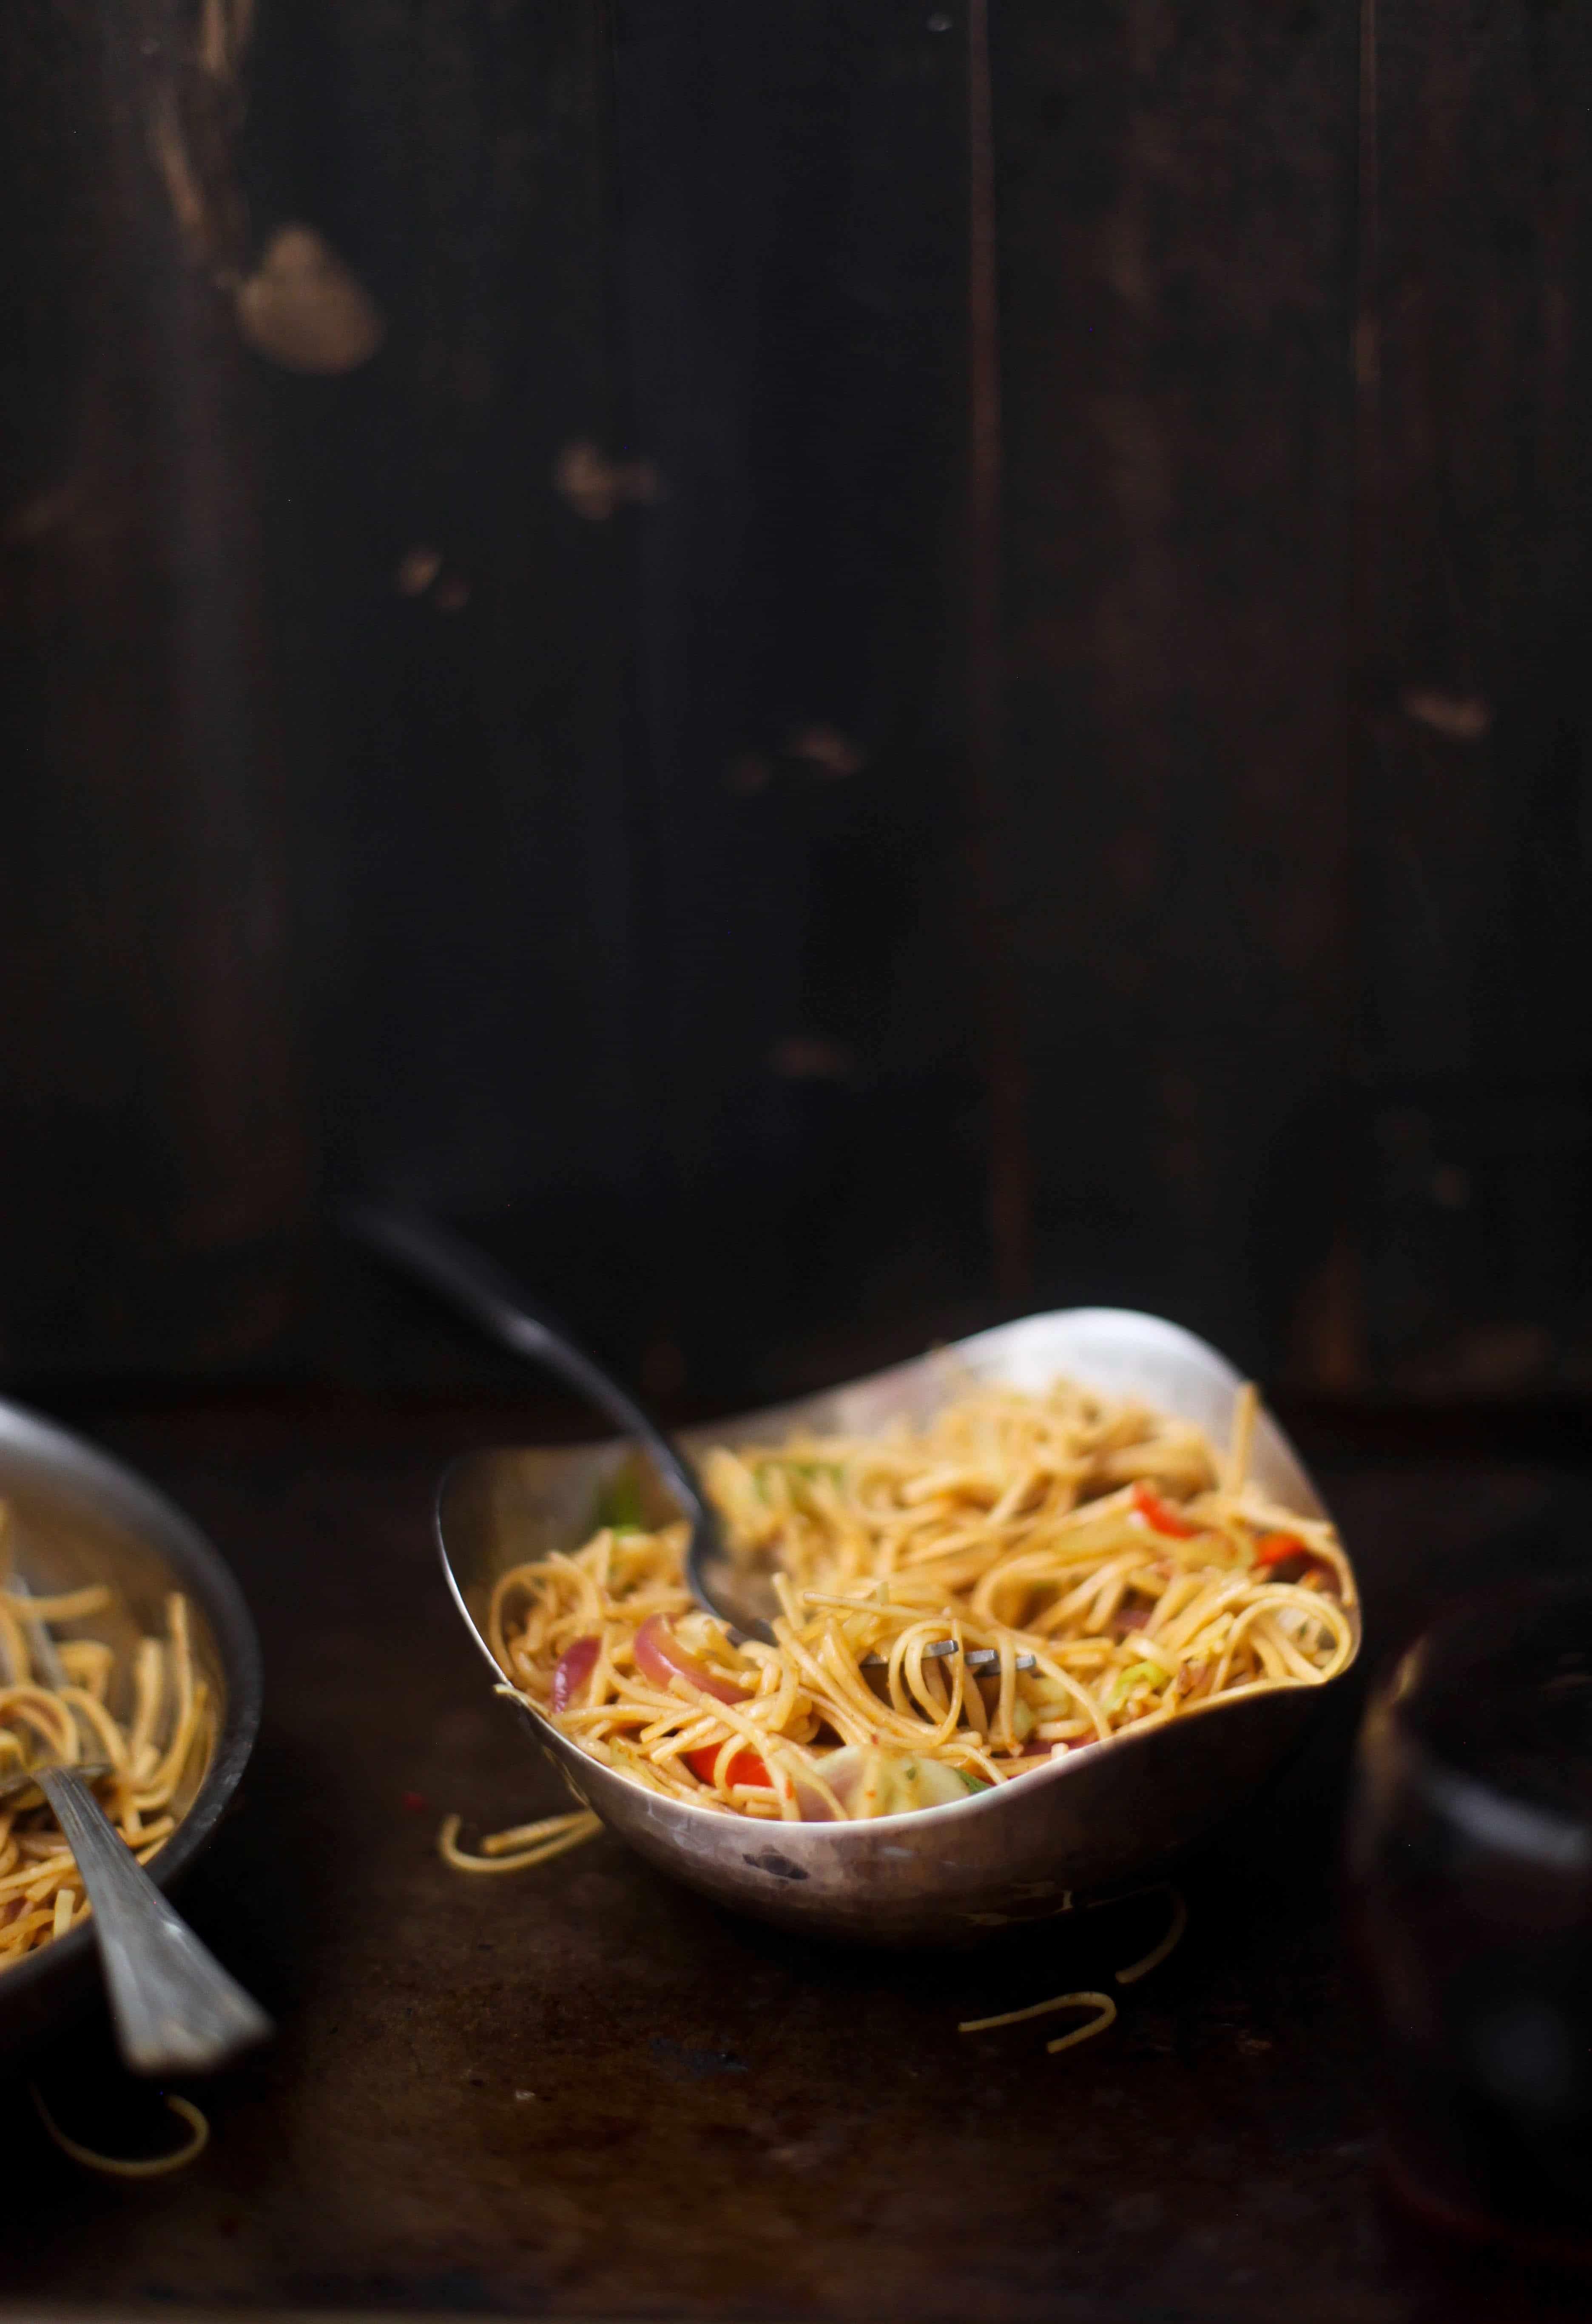 Vegetable Hakka Noodles02, SInfullySpicy